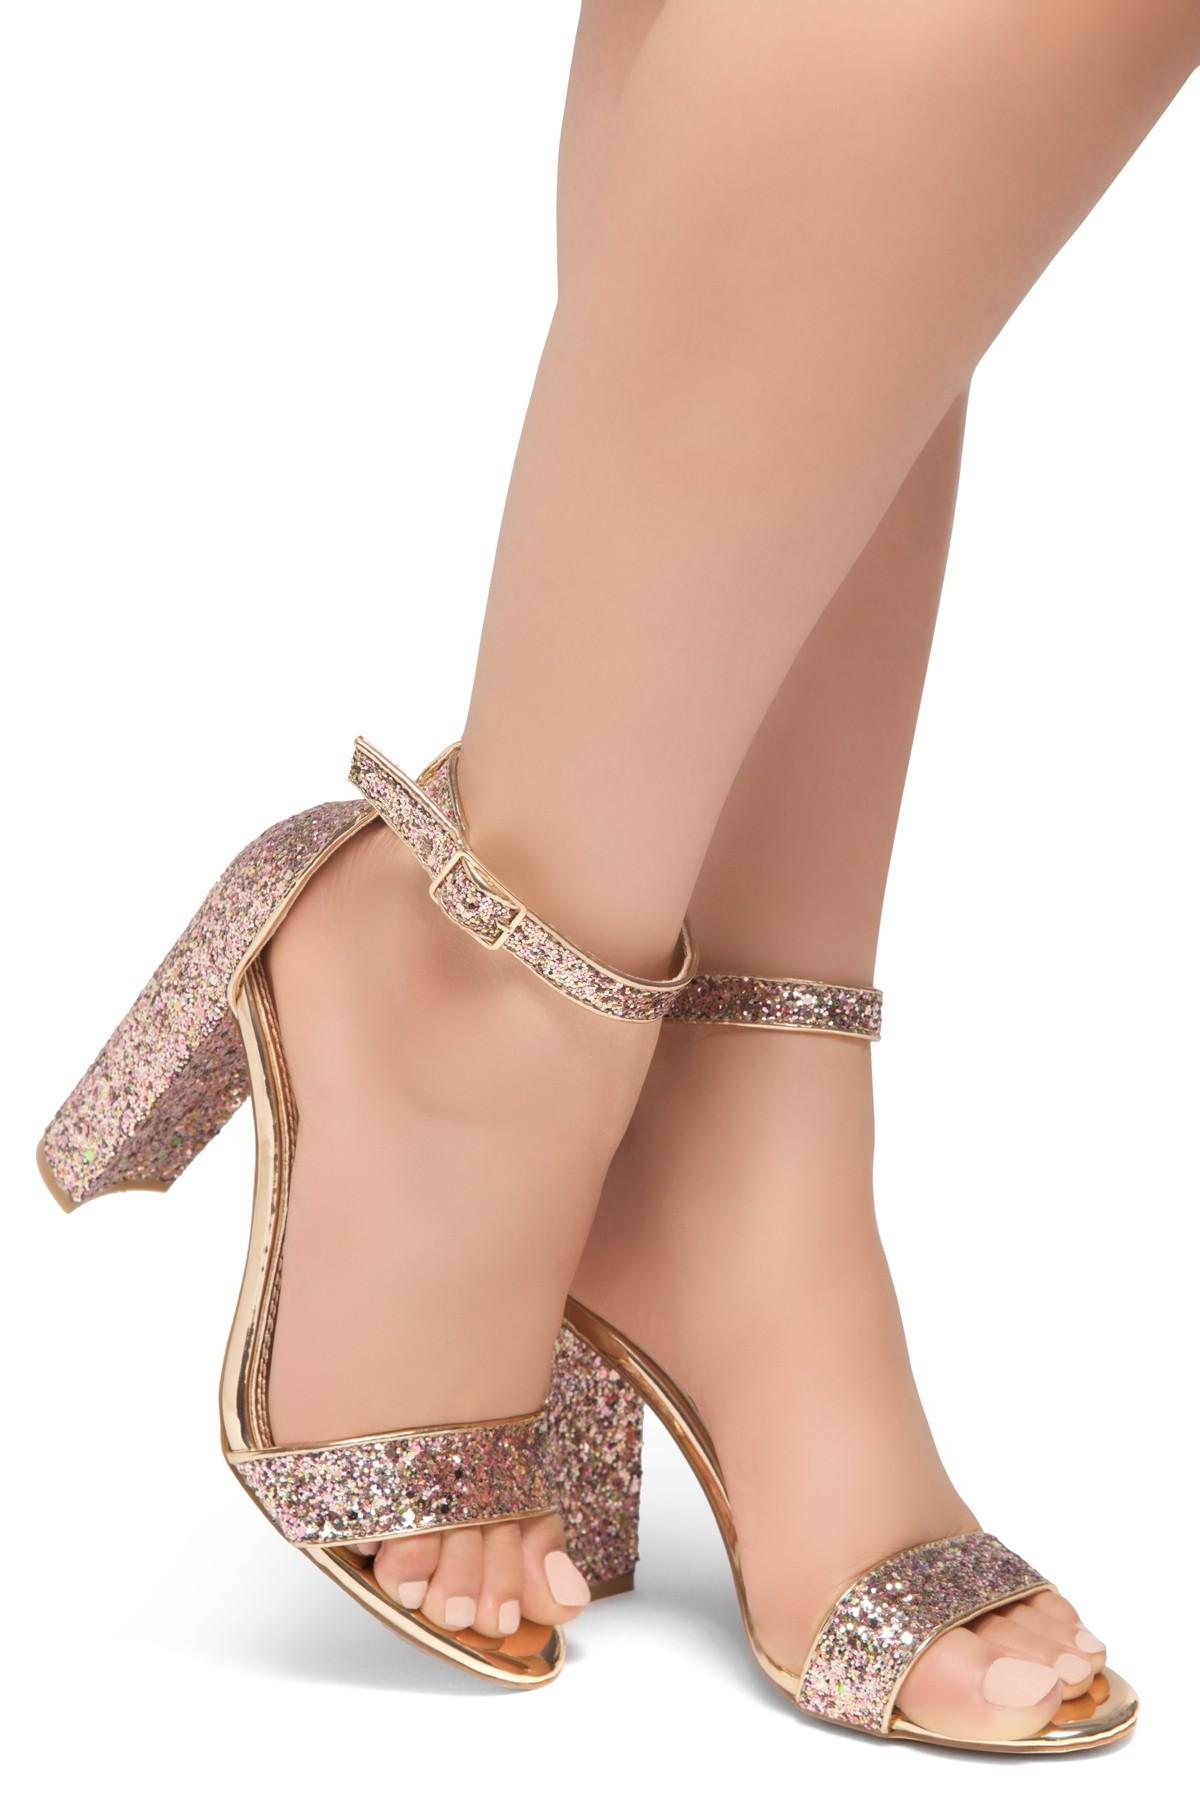 05d2923e363239 HerStyle Rosemmina Open Toe Ankle Strap Chunky Heel ...